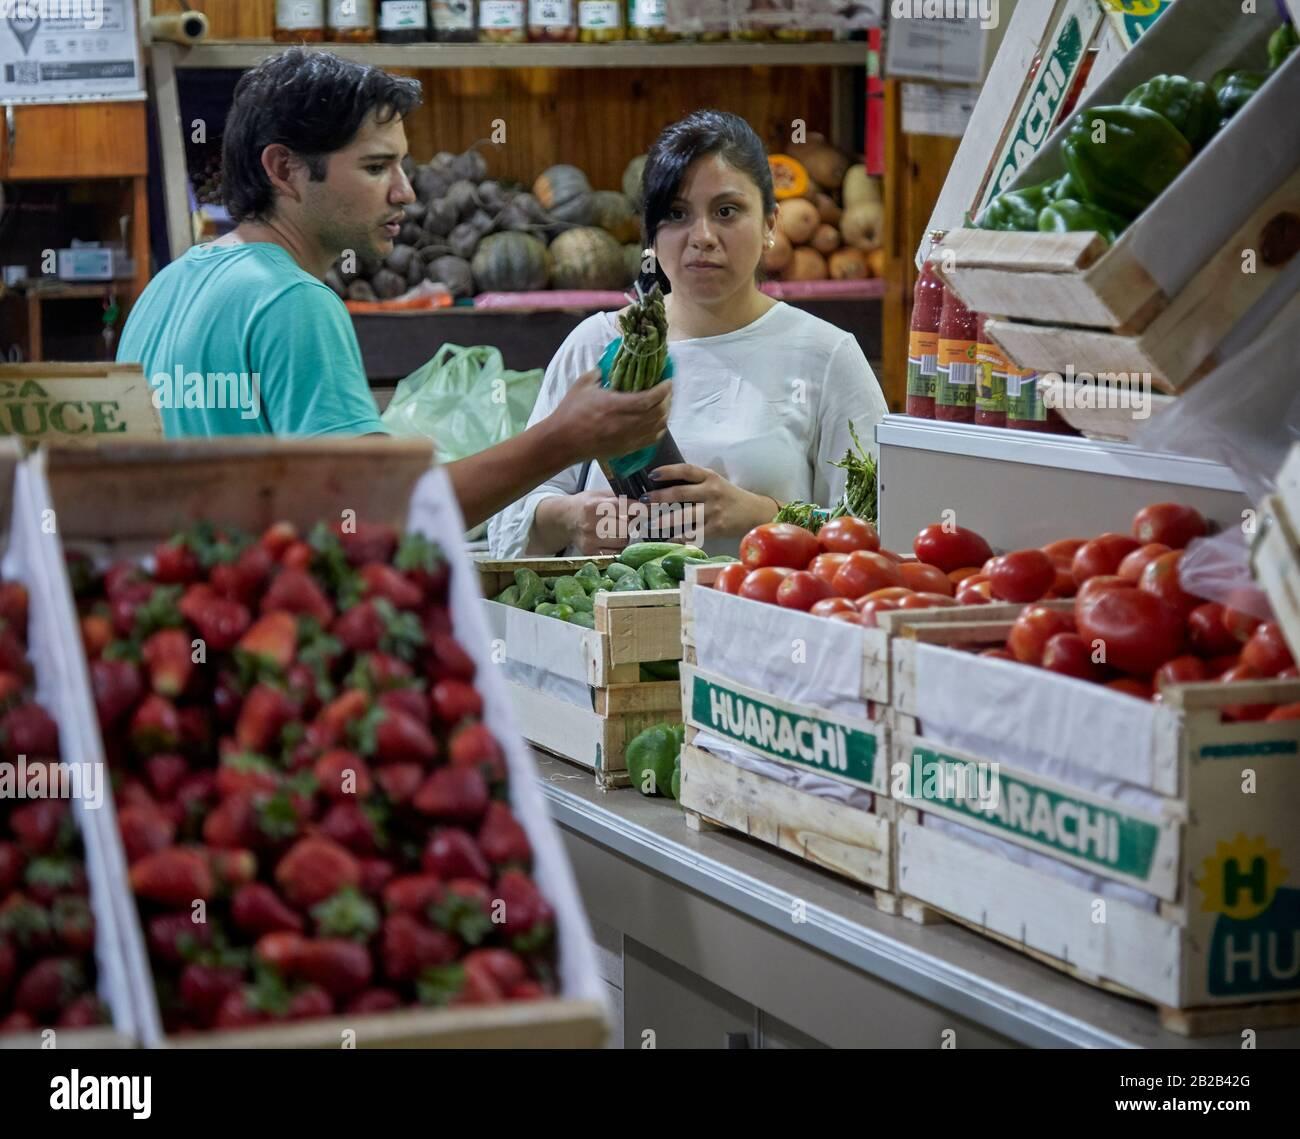 MENDOZA, ARGENTINIEN, 19/12/2017. Greengrocery, Verkauf von Gemüse und Obst, Mercado Central, Mendoza City. Foto: Axel Lloret / www.allofotografia.CO Stockfoto